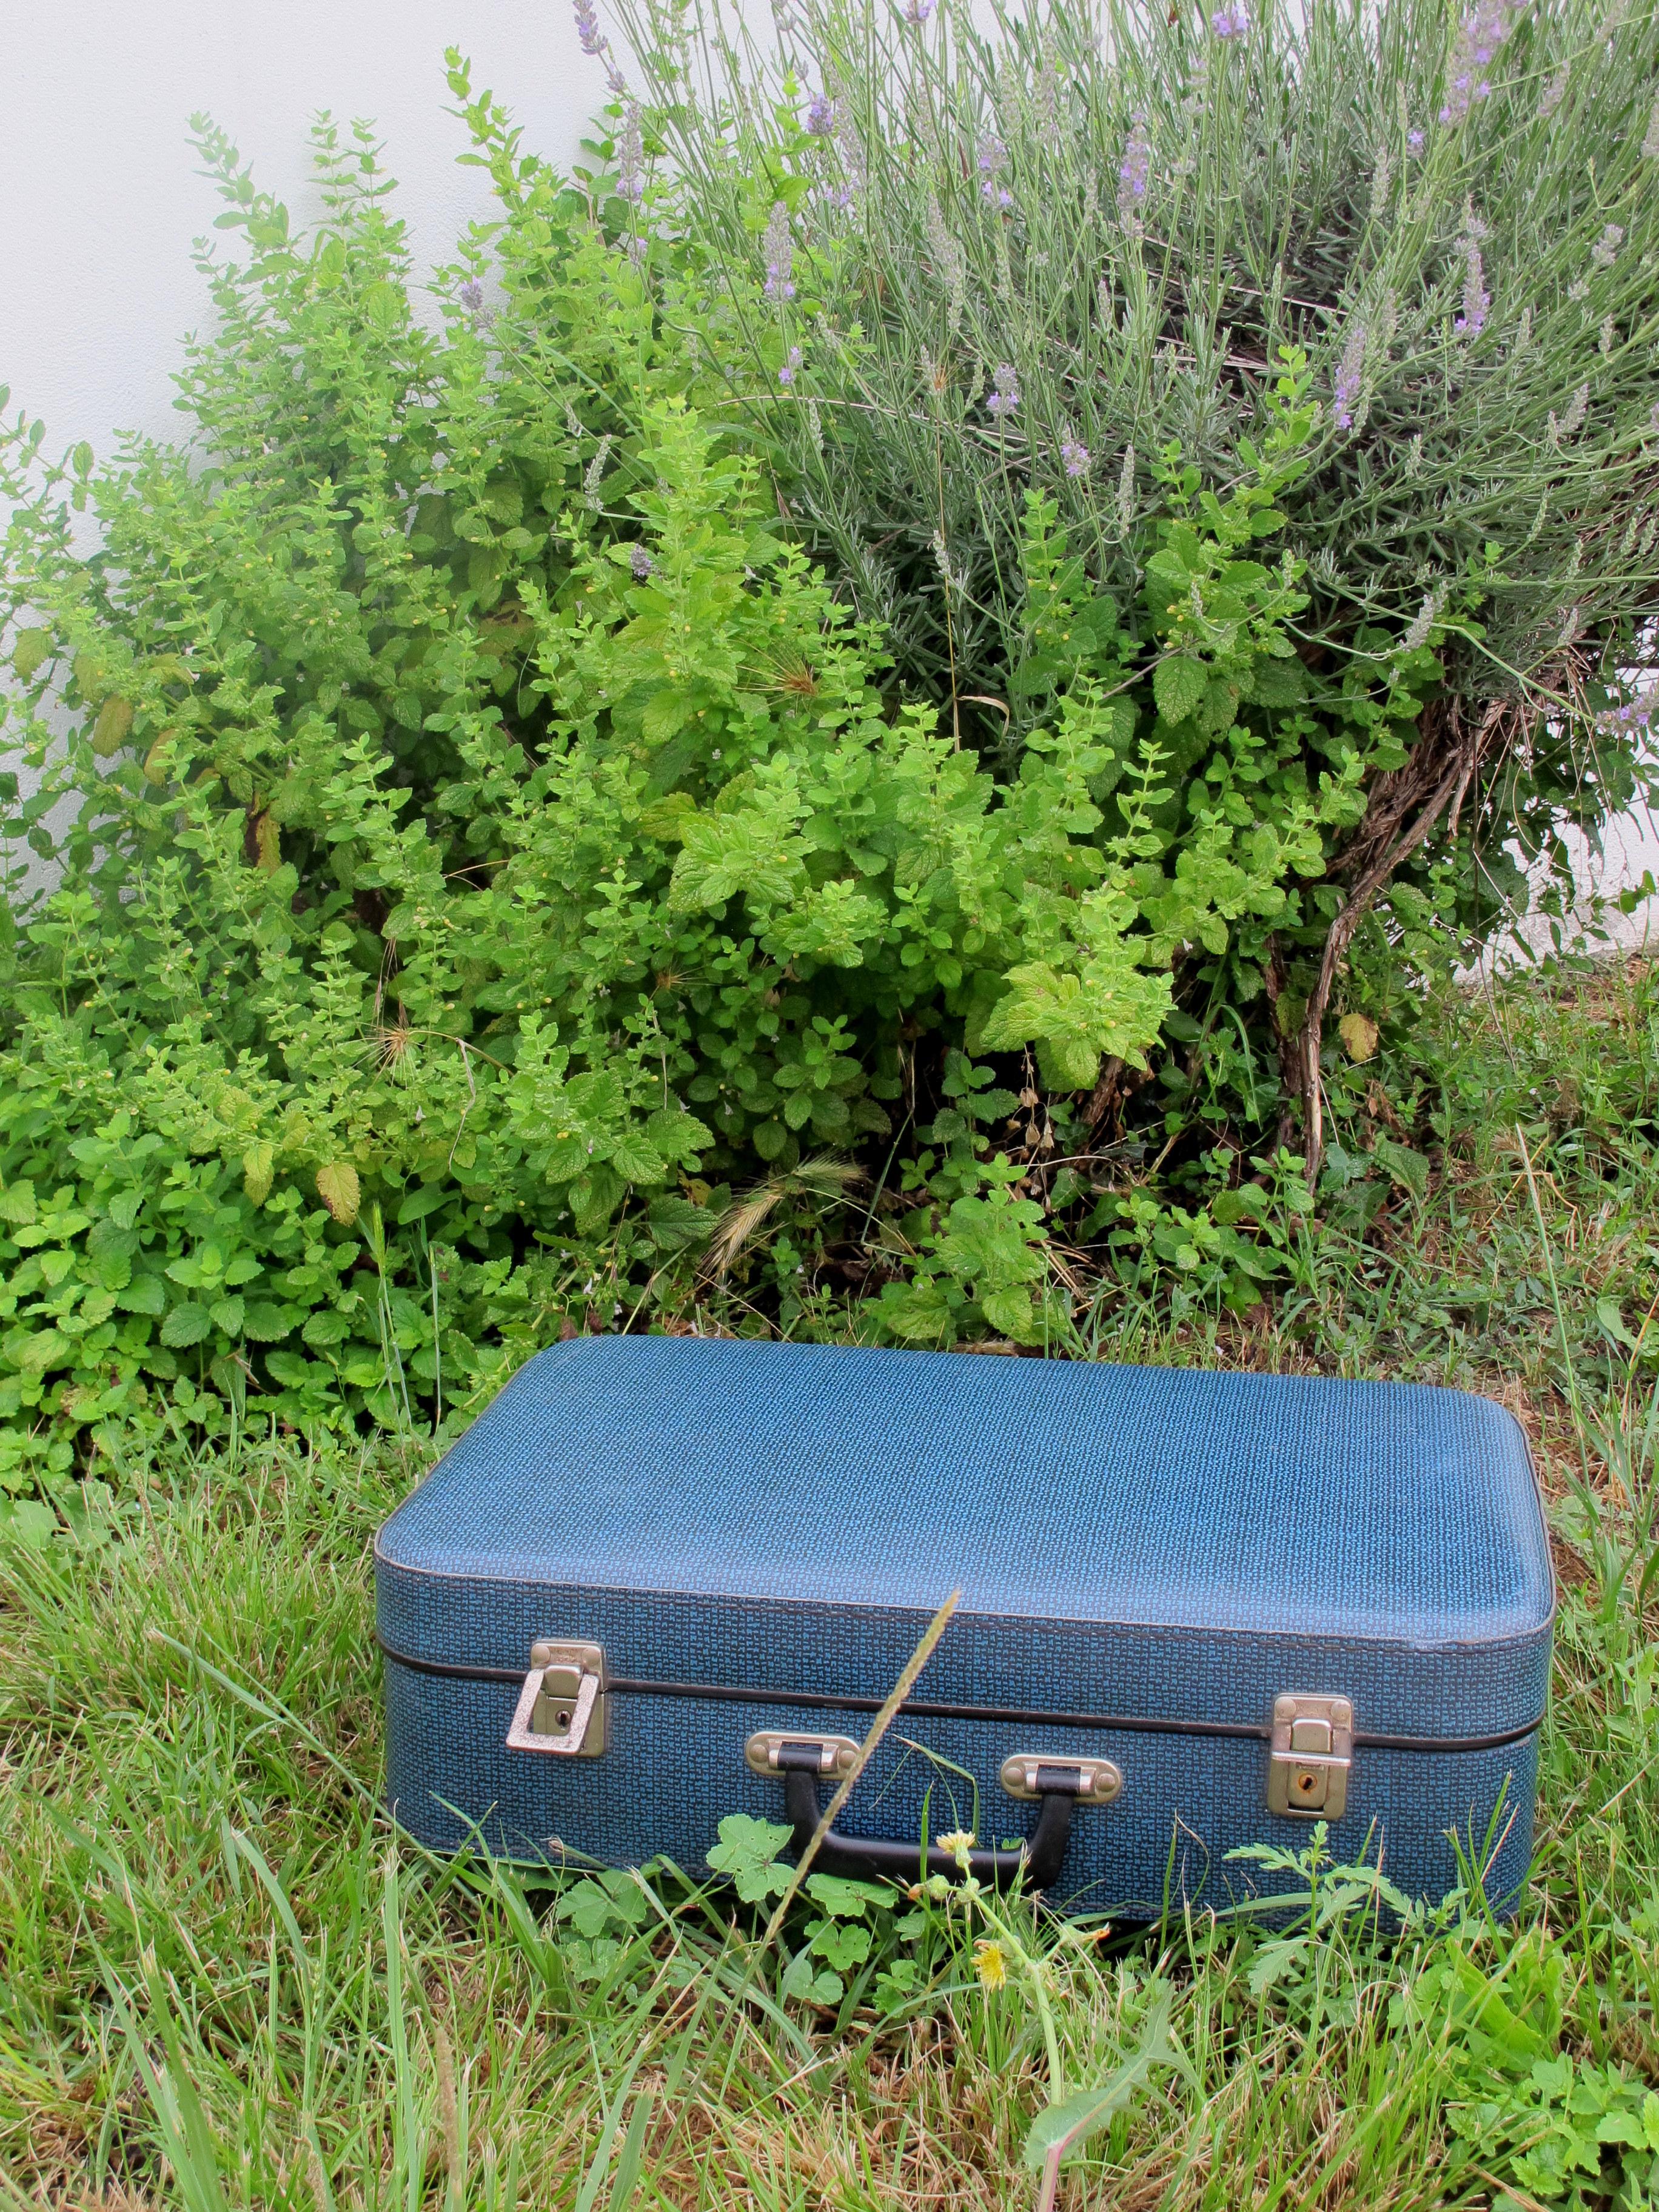 valise bleue